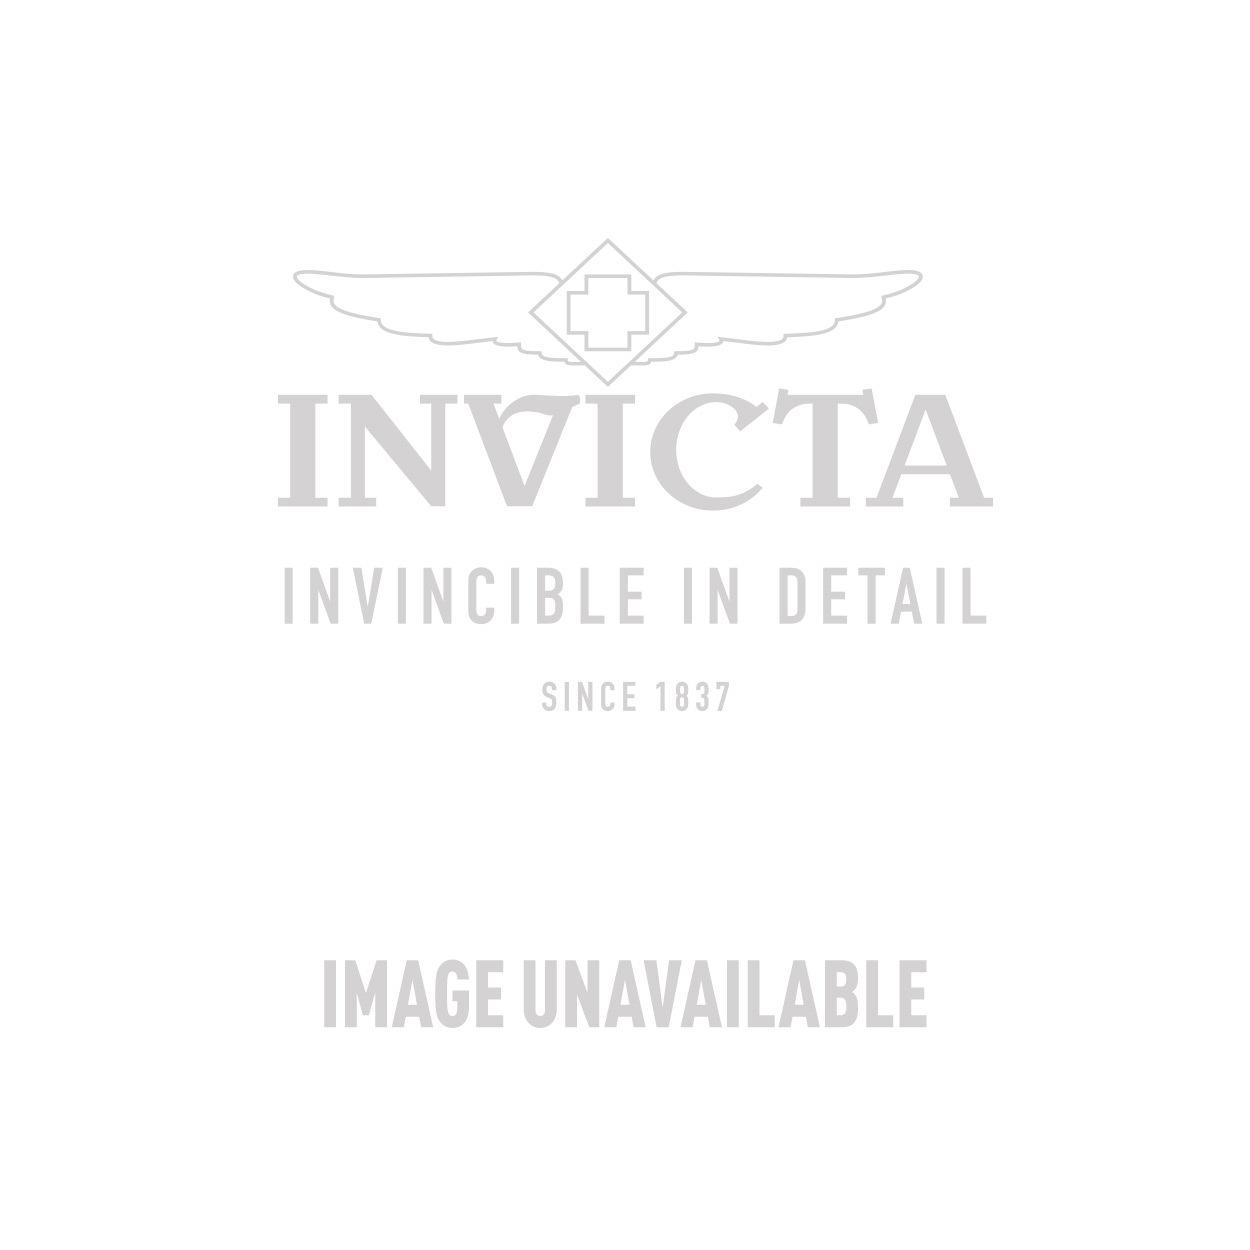 Invicta Corduba Swiss Movement Quartz Watch - Stainless Steel case with Blue tone Polyurethane band - Model 18832